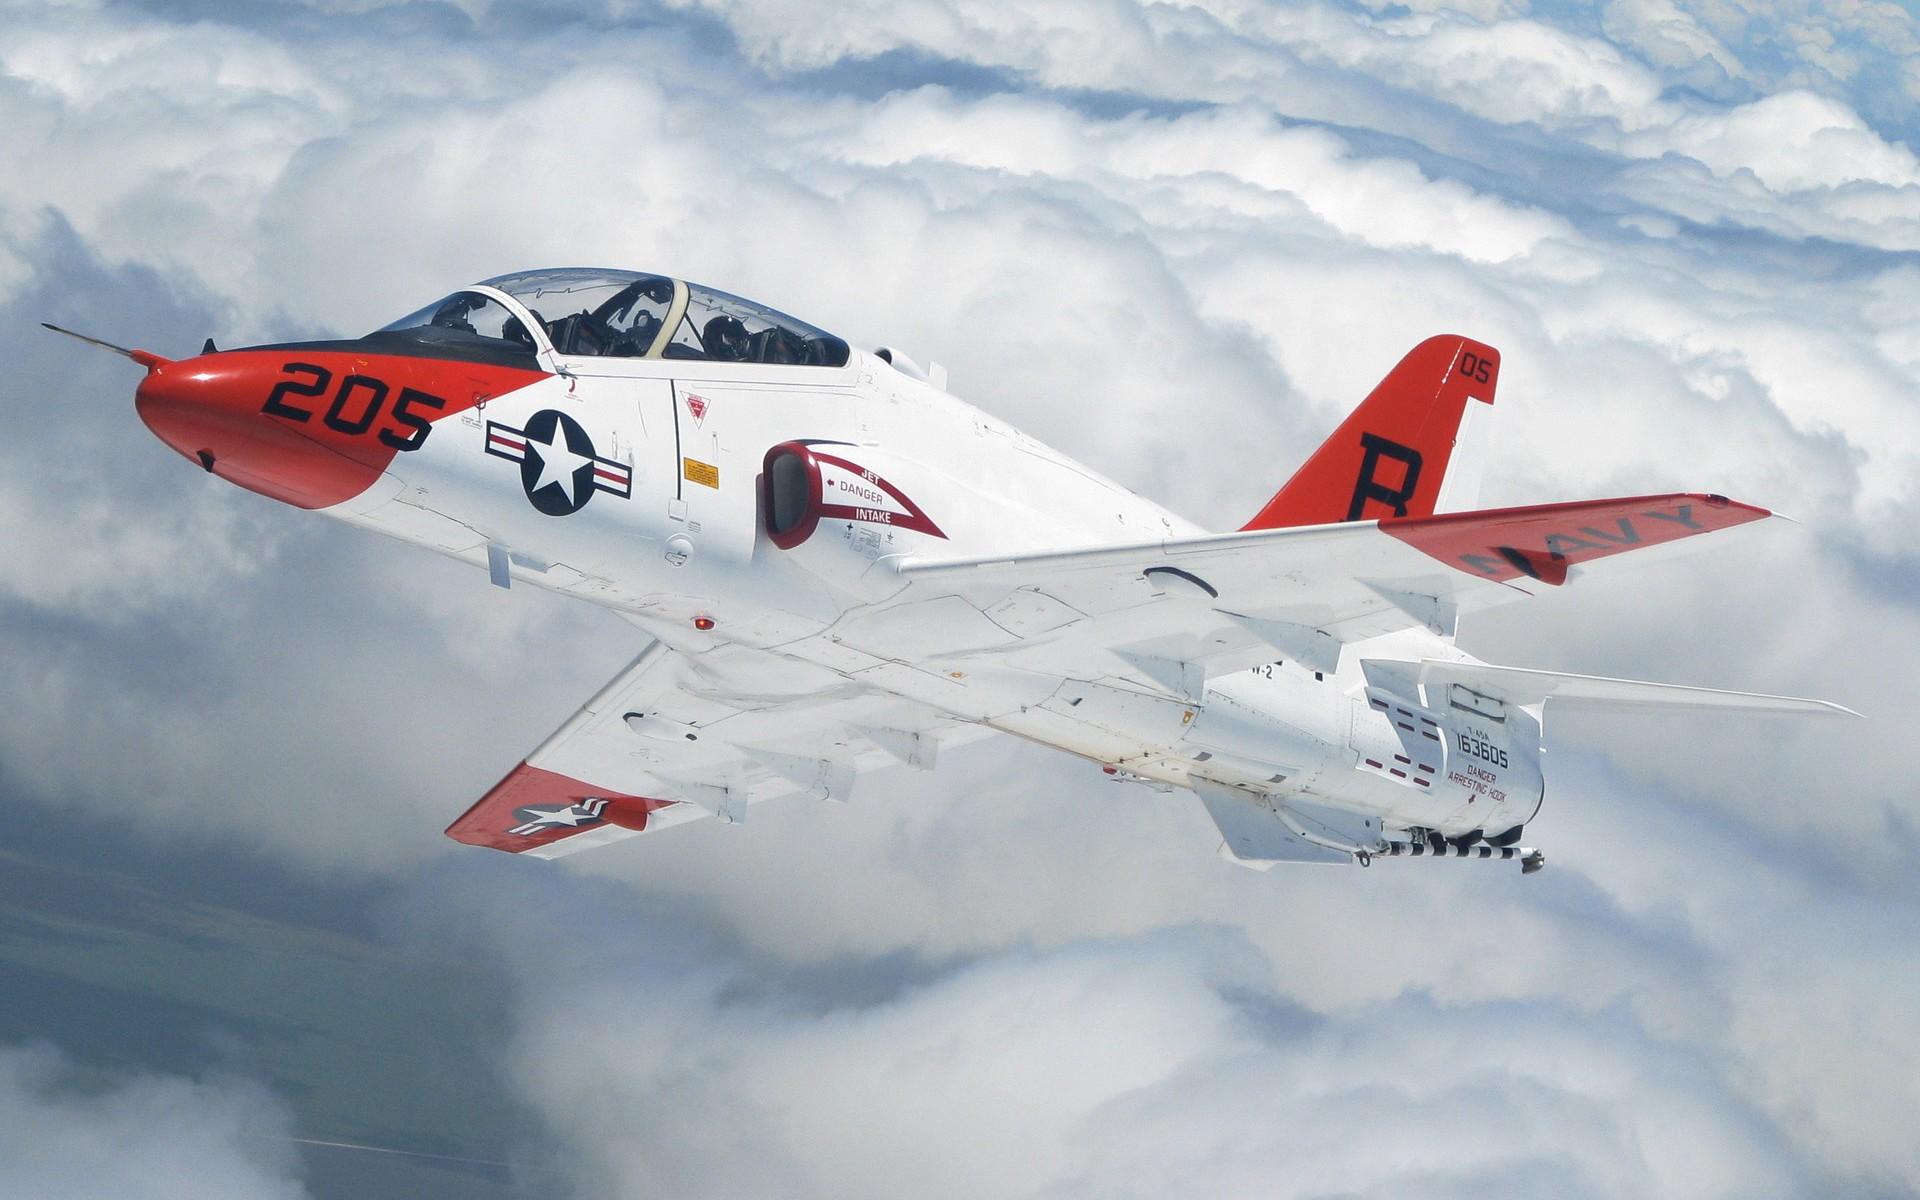 Avion de Guerra en los aires - 1920x1200